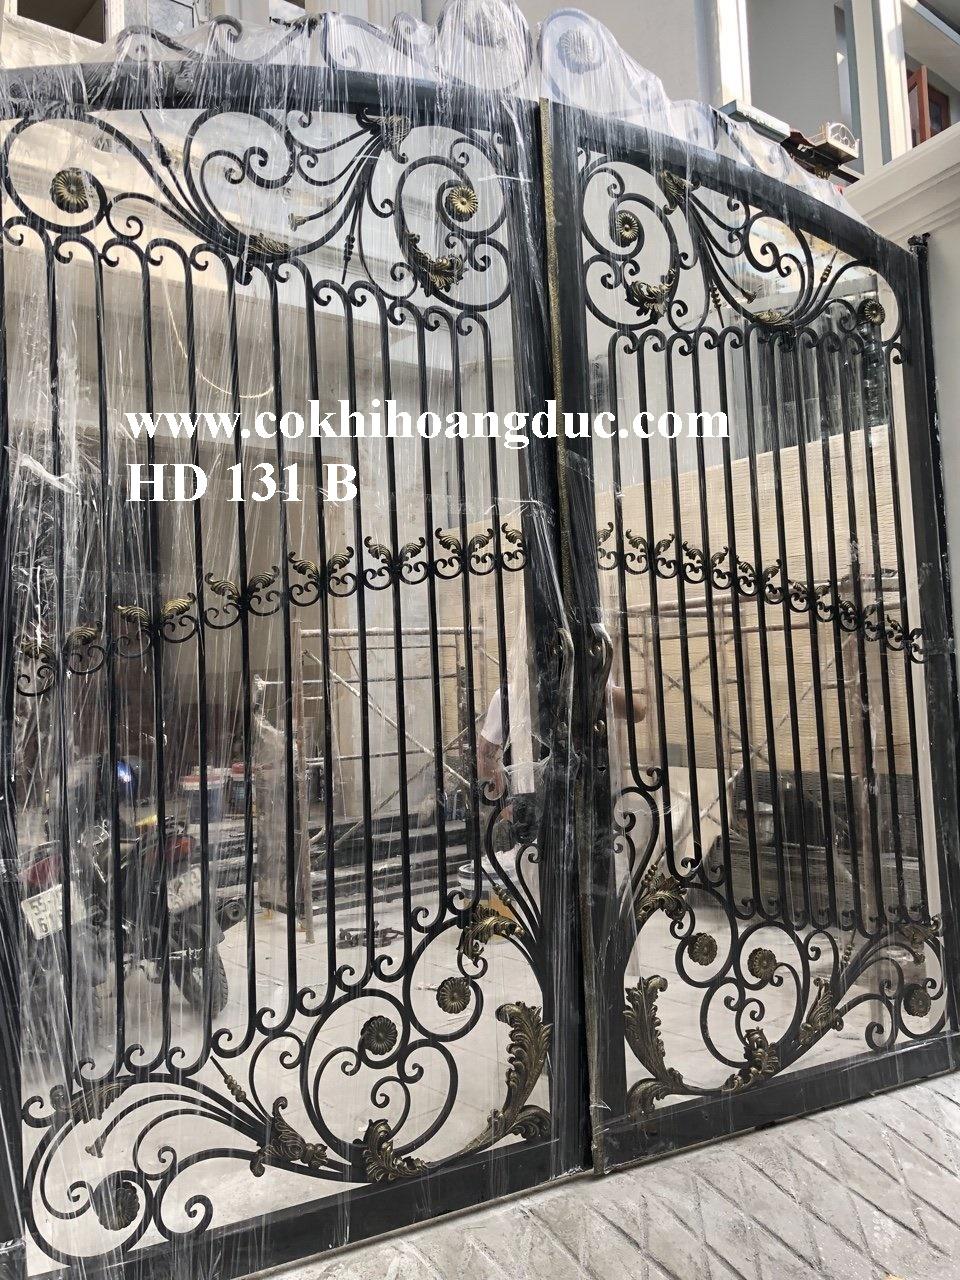 CỬA CỔNG HD 131 B